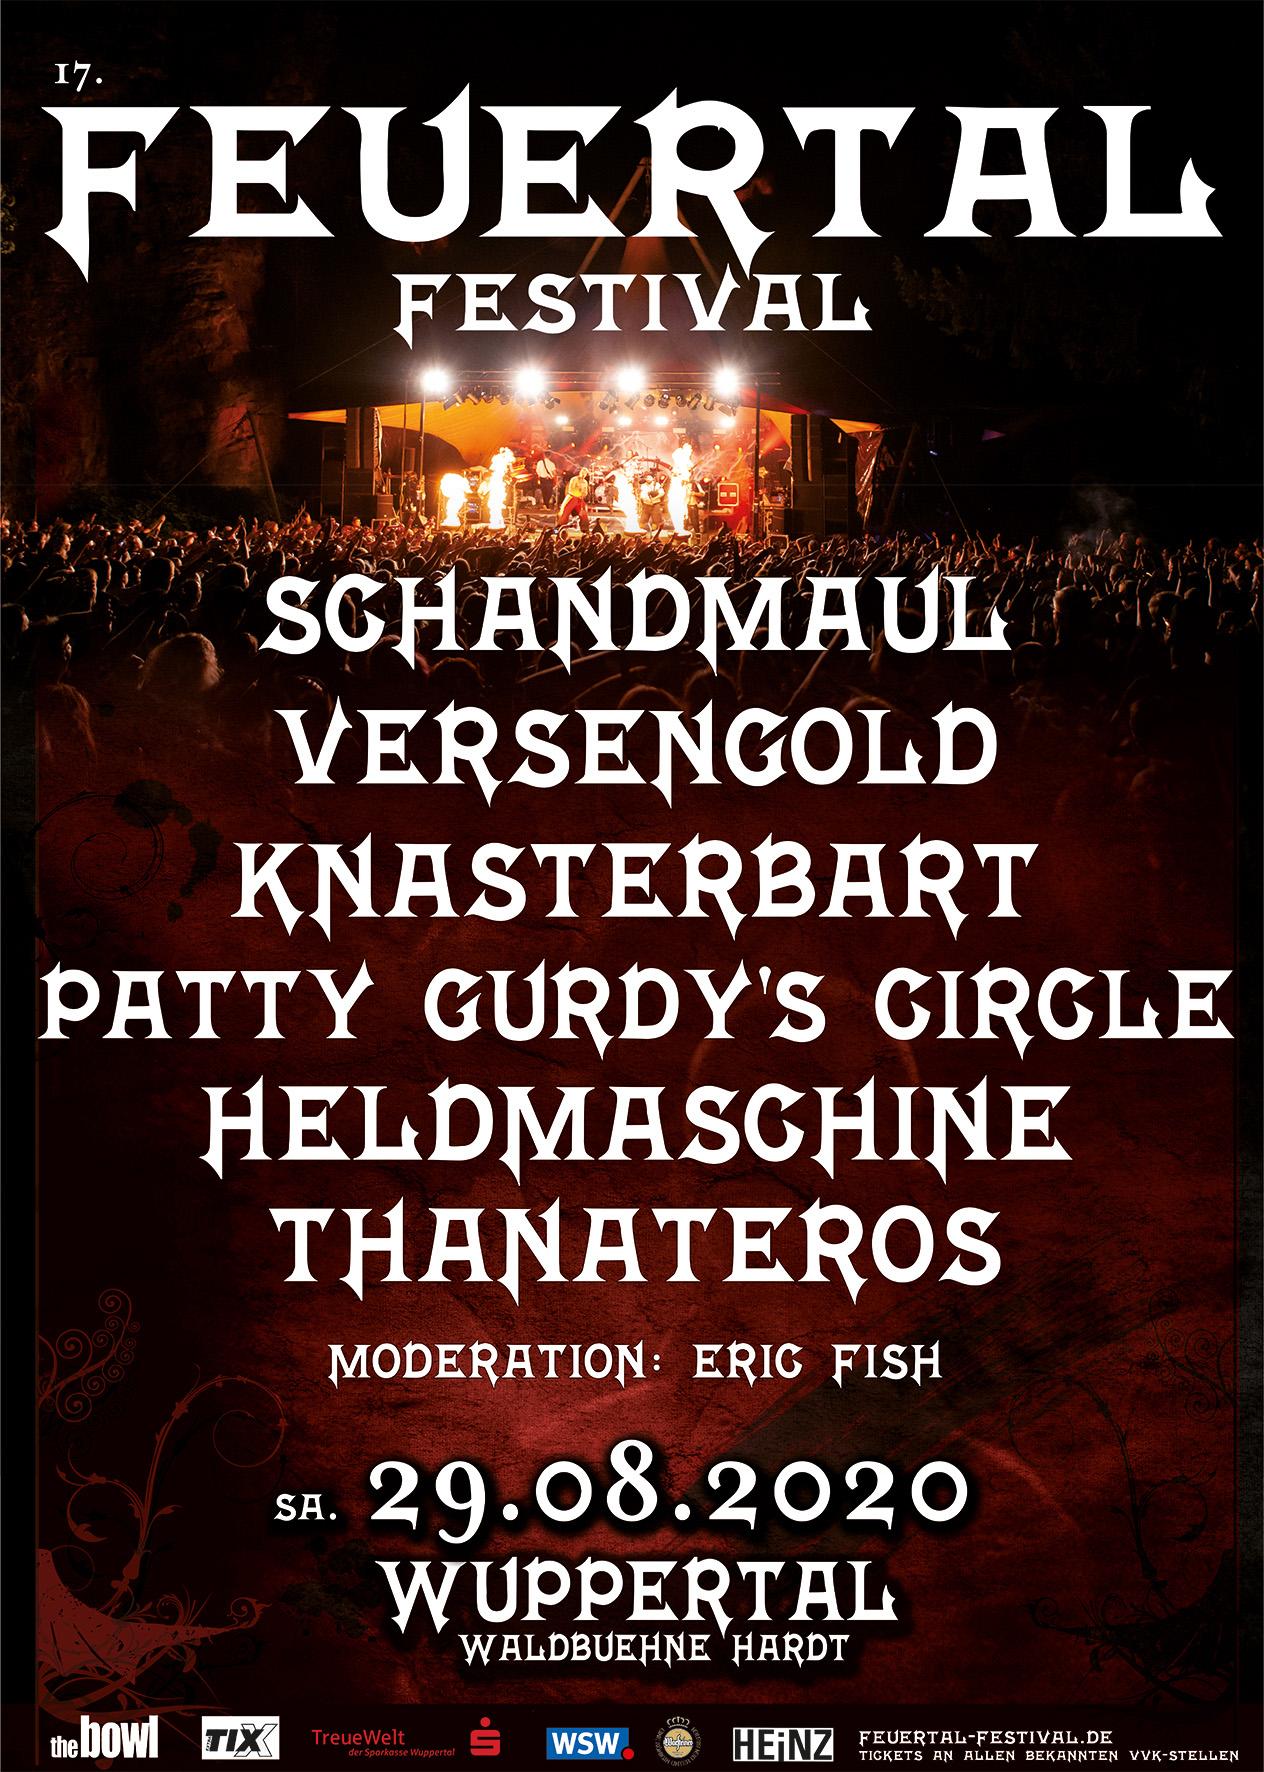 Schandmaul, Versengold.. das Feuertal-Festival 2020 wird wieder heiß